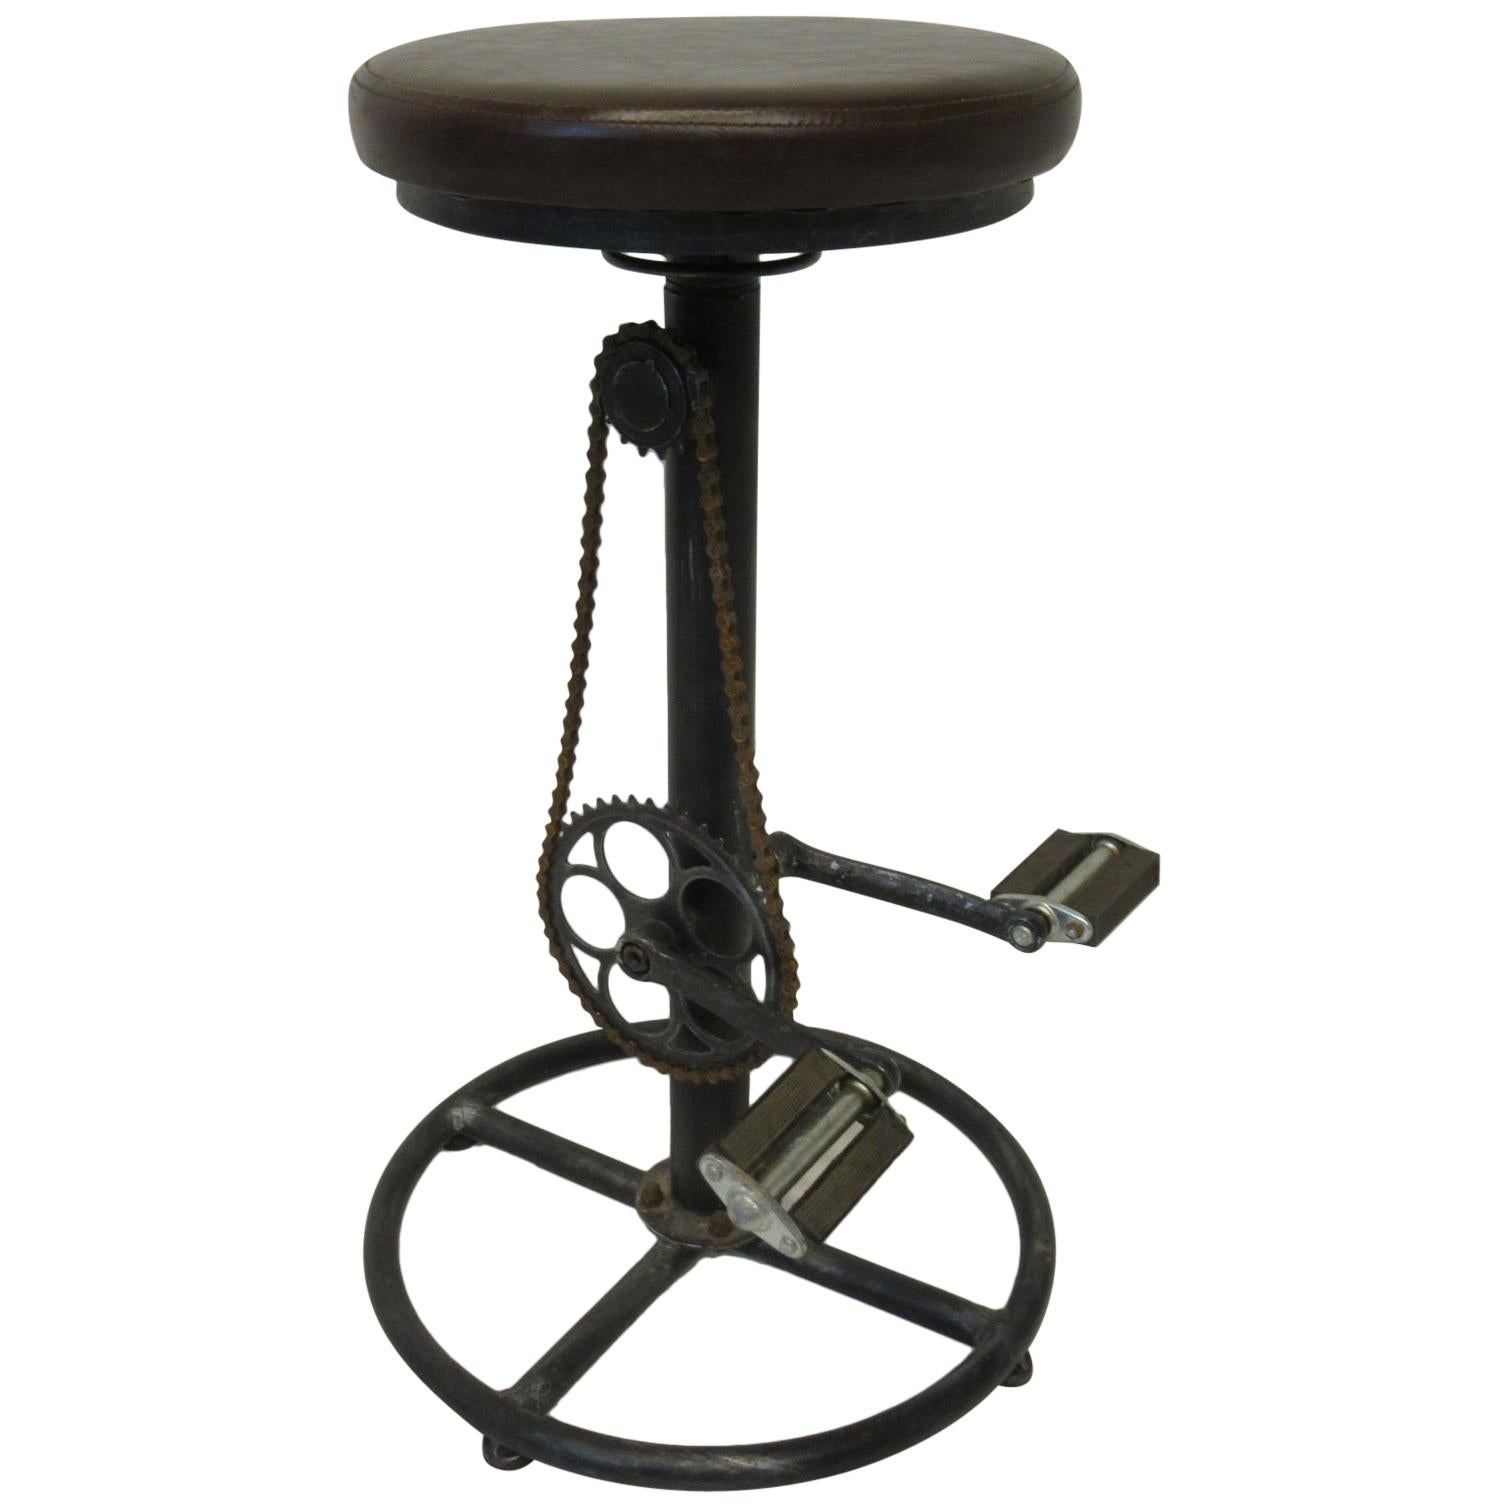 Industrial Folk Art Bicycle Stool